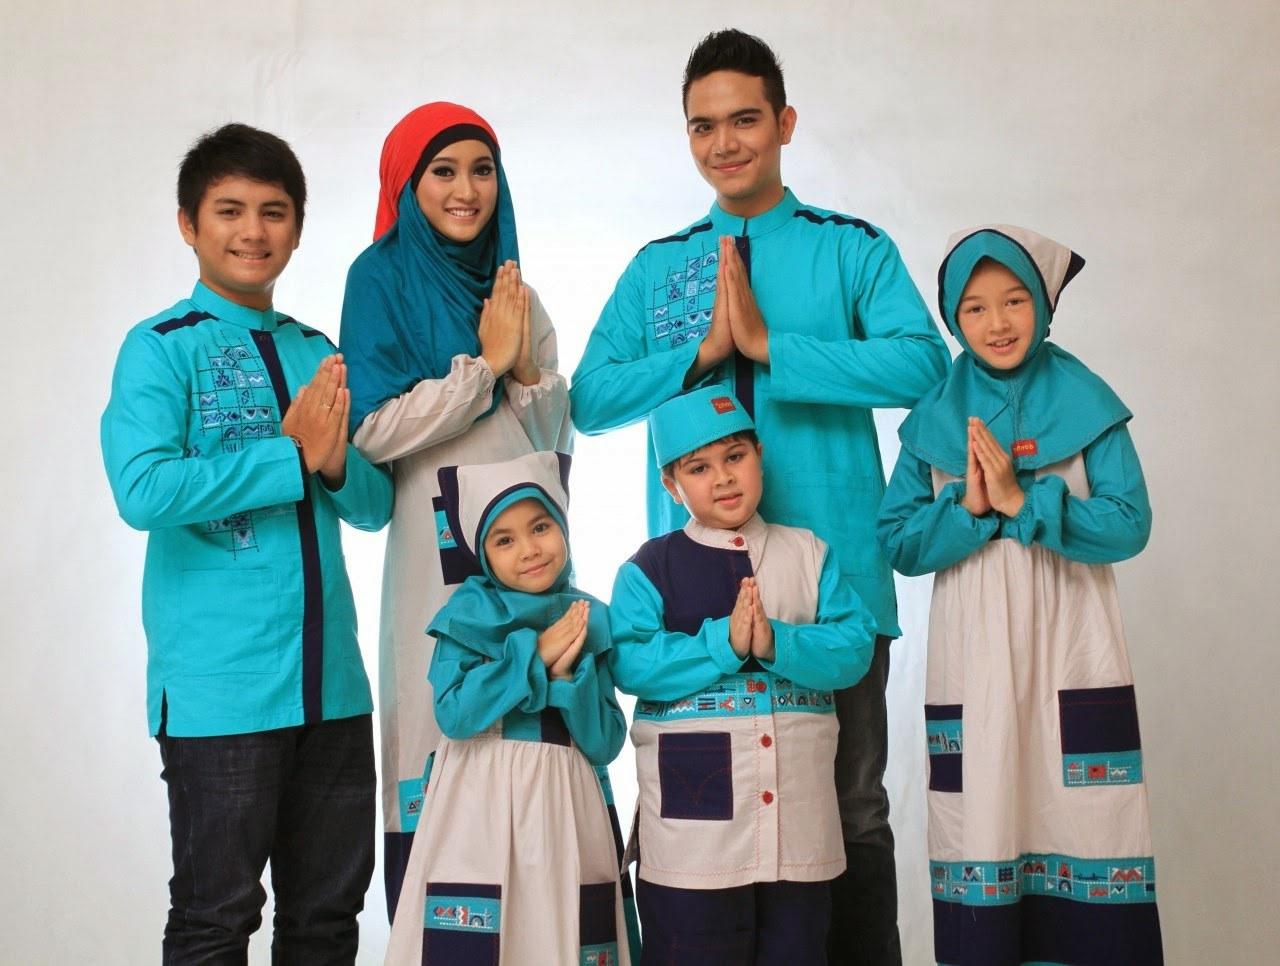 Bentuk Gambar Baju Lebaran Keluarga Whdr Kumpulan Foto Model Baju Kebaya Lebaran Trend Baju Kebaya